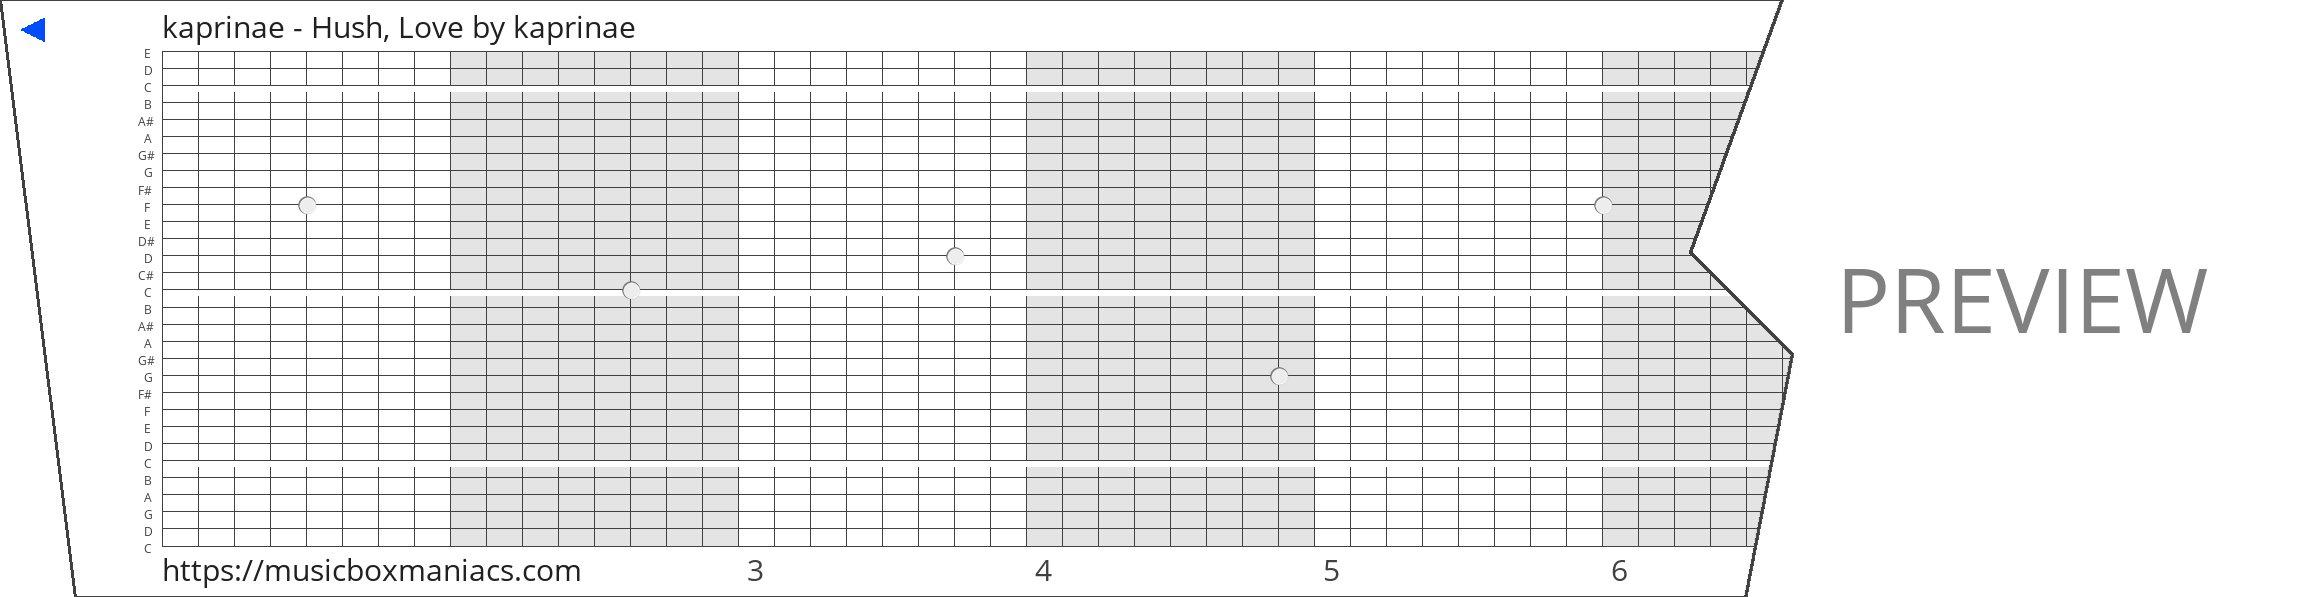 kaprinae - Hush, Love 30 note music box paper strip